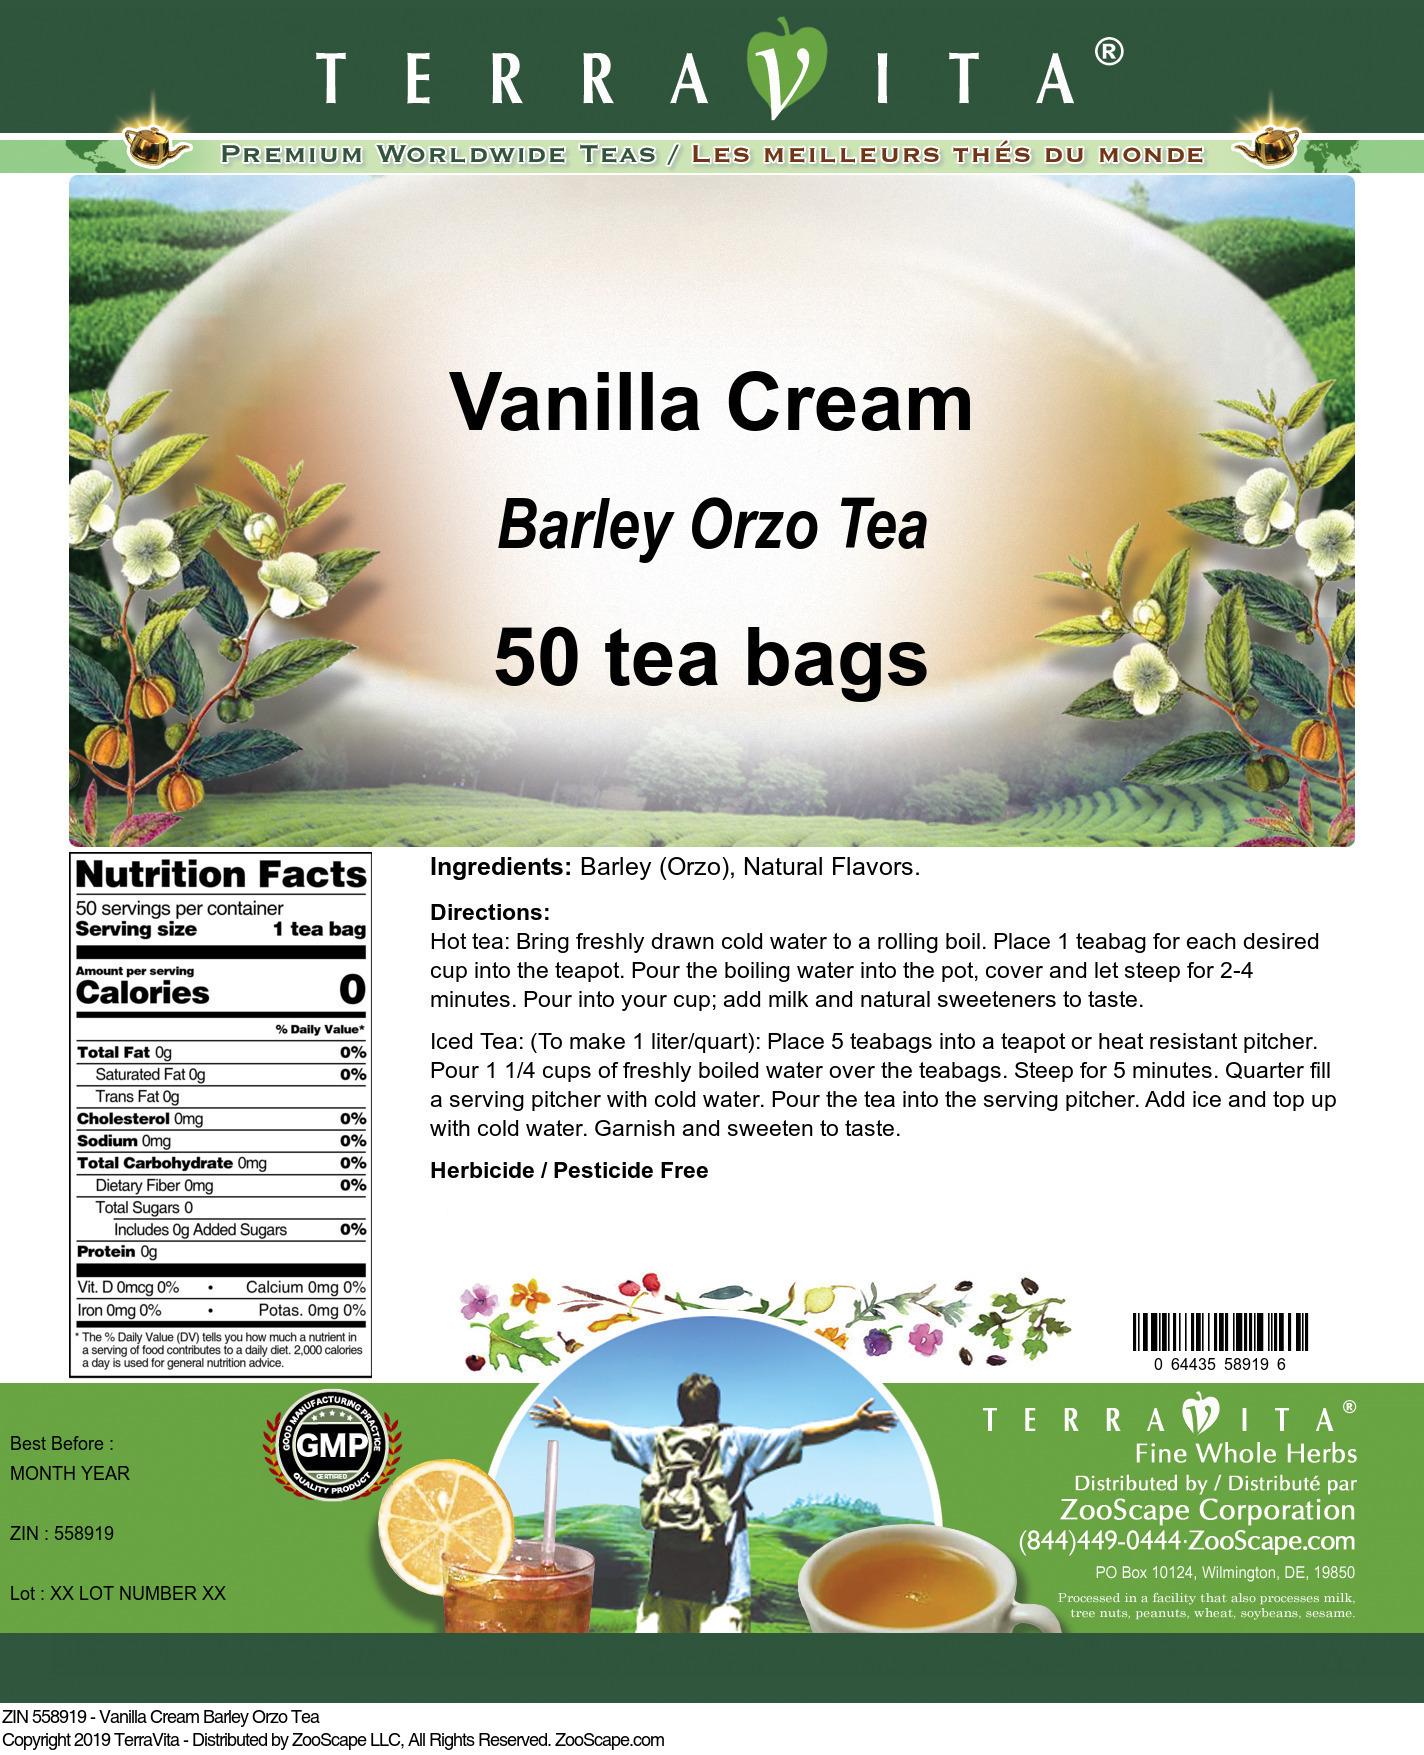 Vanilla Cream Barley Orzo Tea